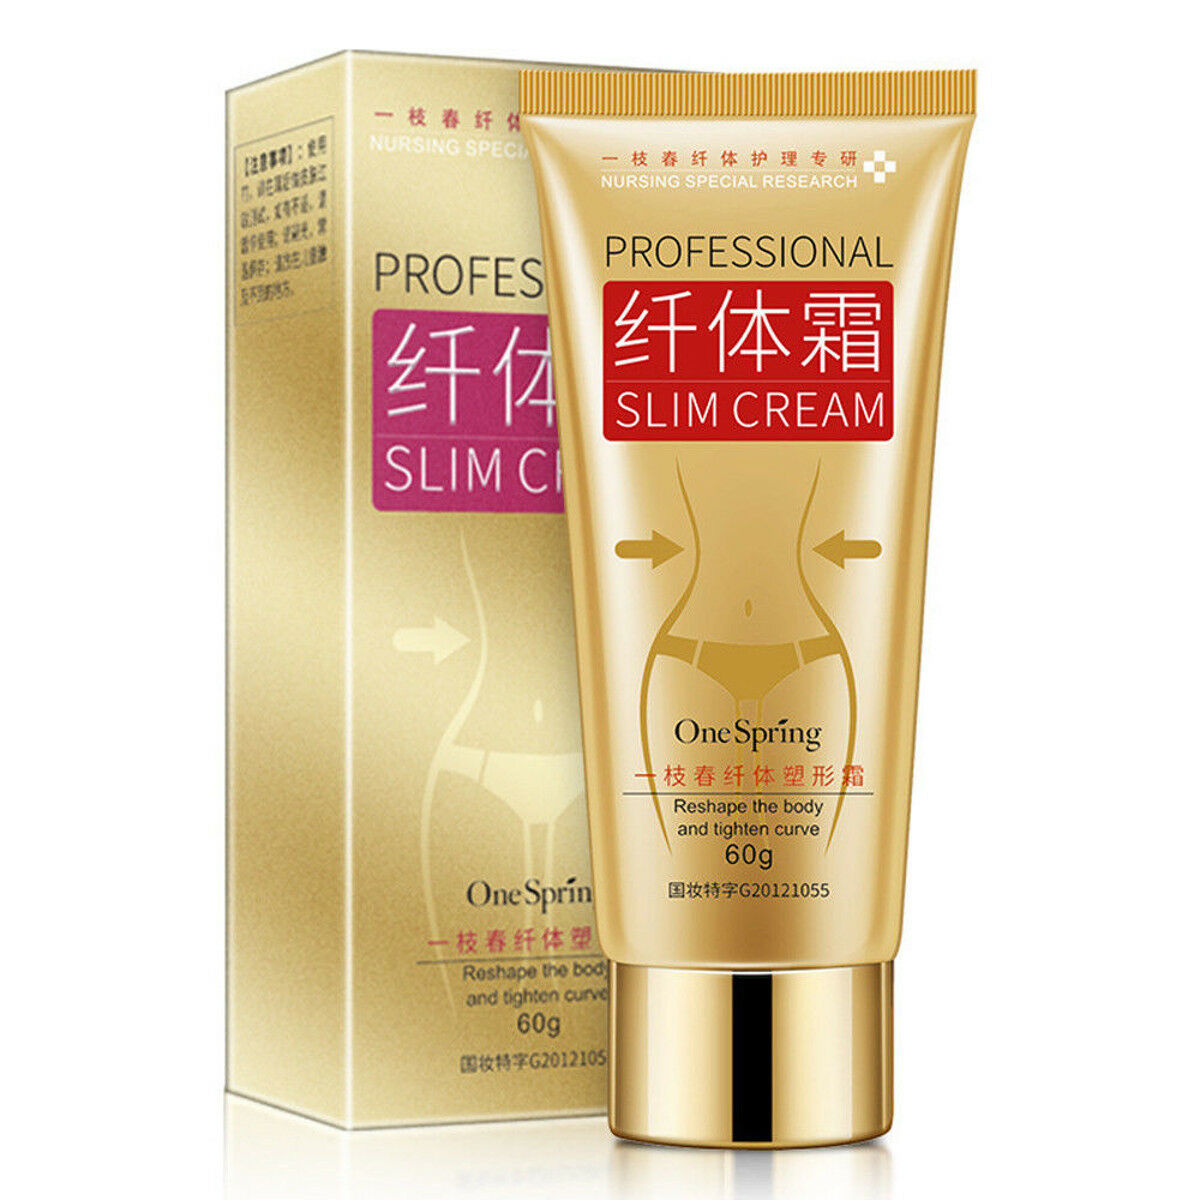 60g Body Leg Slimming Firming Body Cream Fat Burning Weight Skin Anti-Cellulite